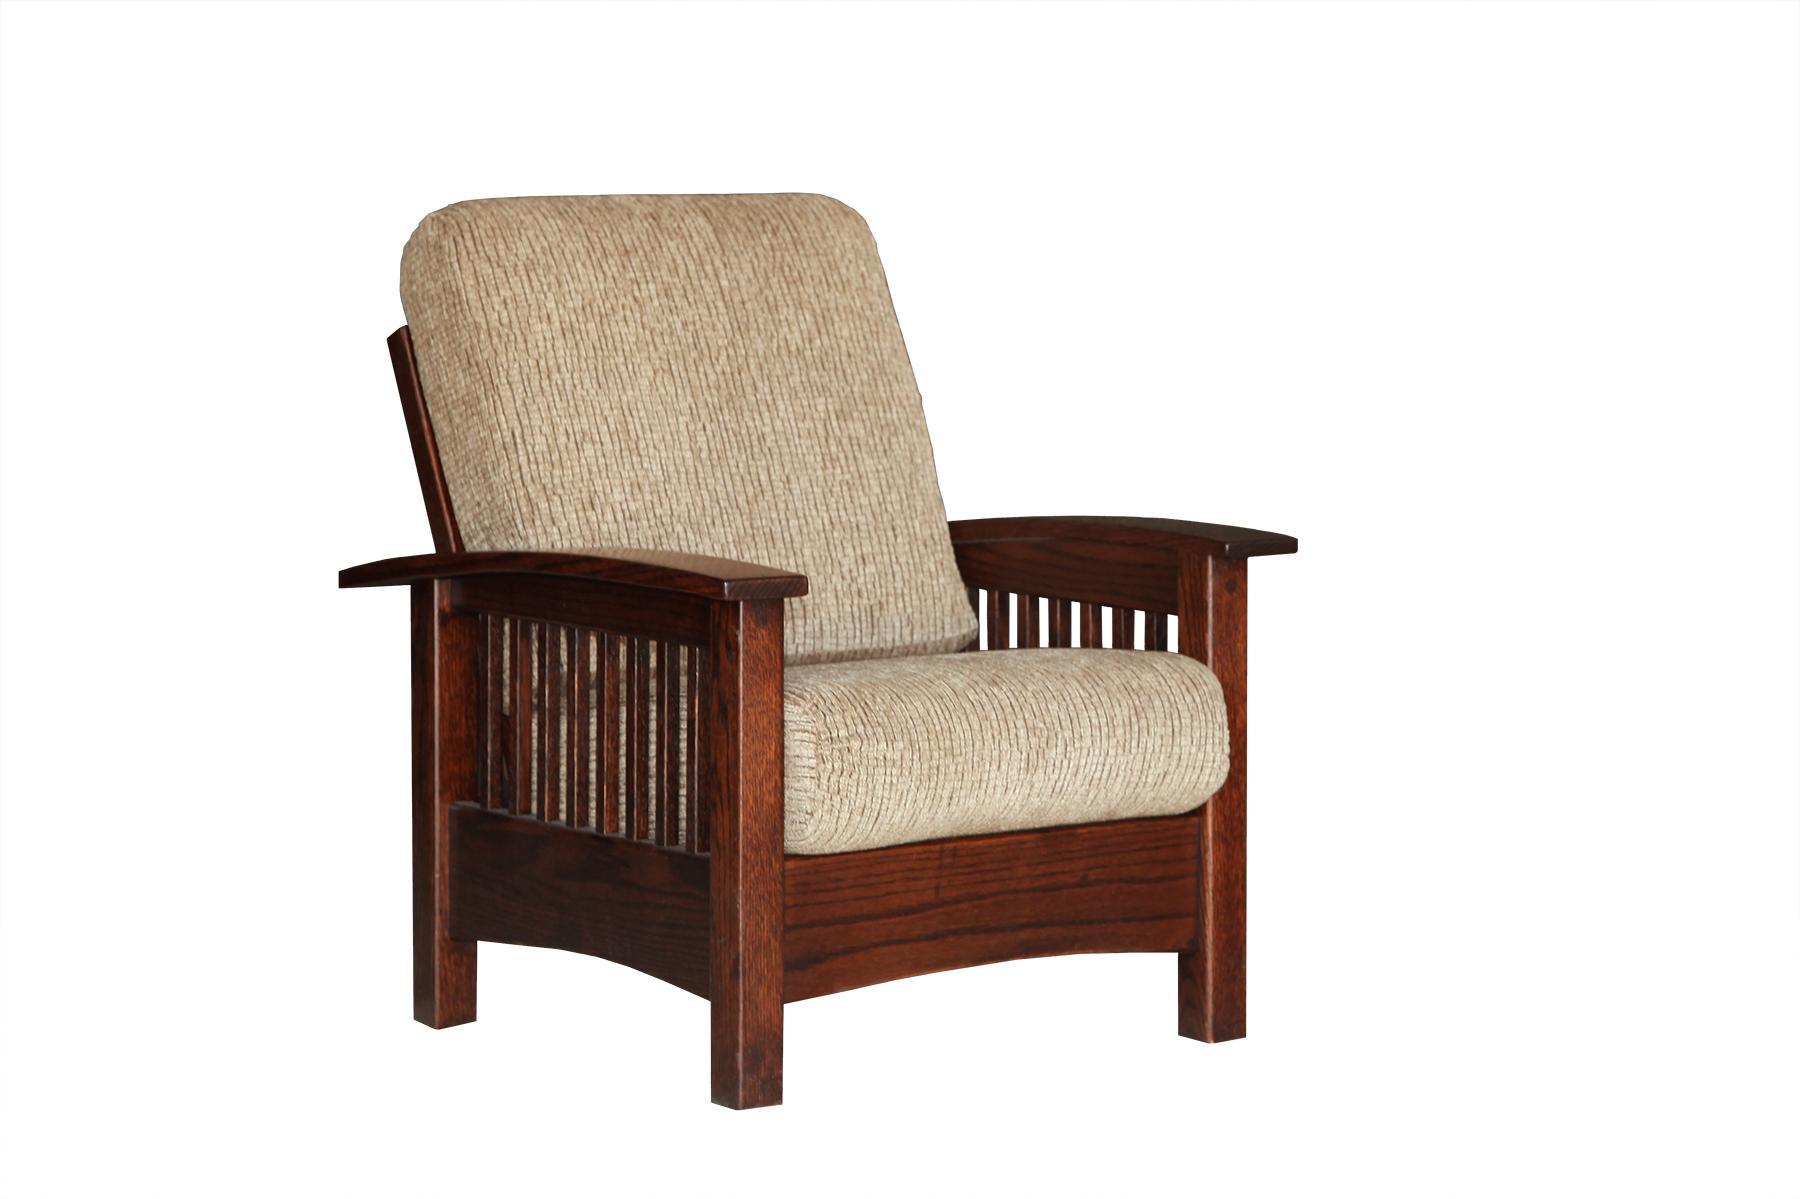 Children's Collection Chair